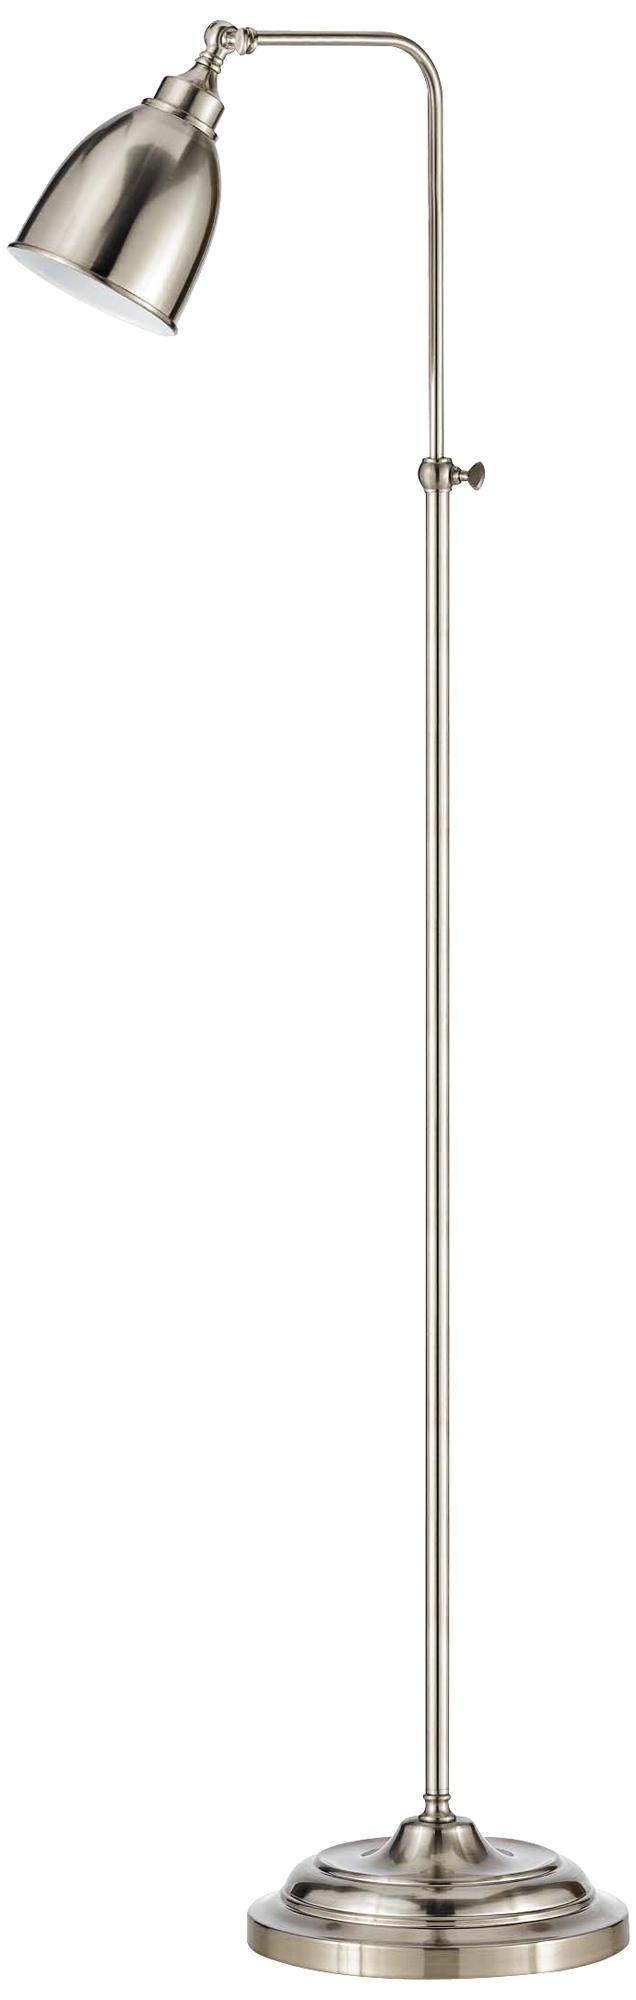 Ikea Kallax High Gloss White ~ Brushed Steel Metal Adjustable Pole Pharmacy Floor Lamp  Steel Metal